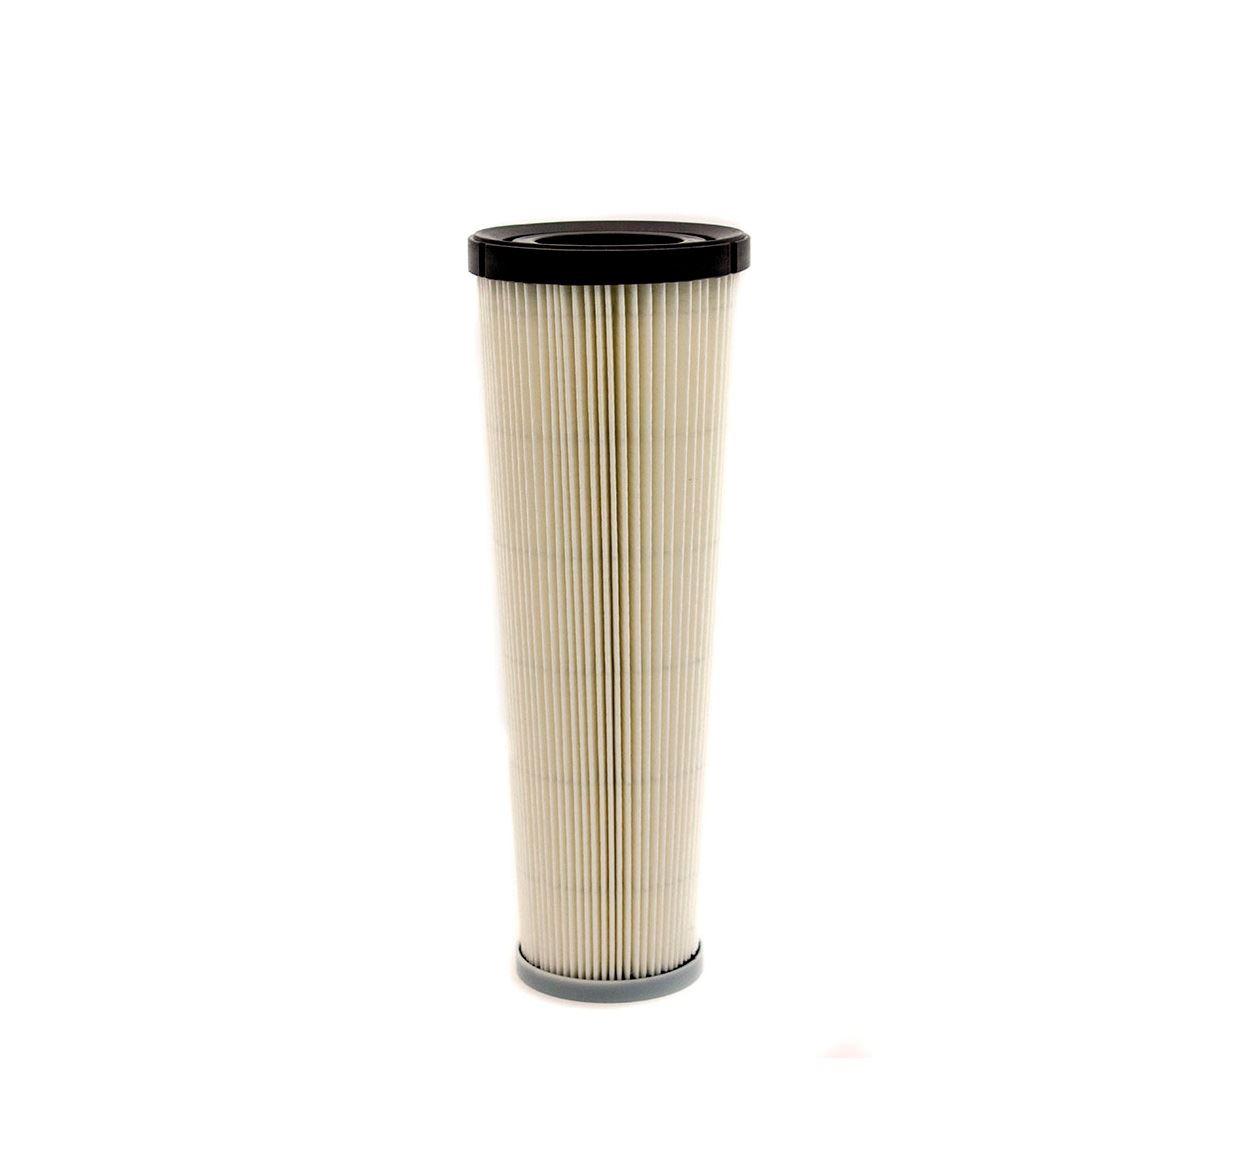 Dust Control DC1800 HEPA Filter